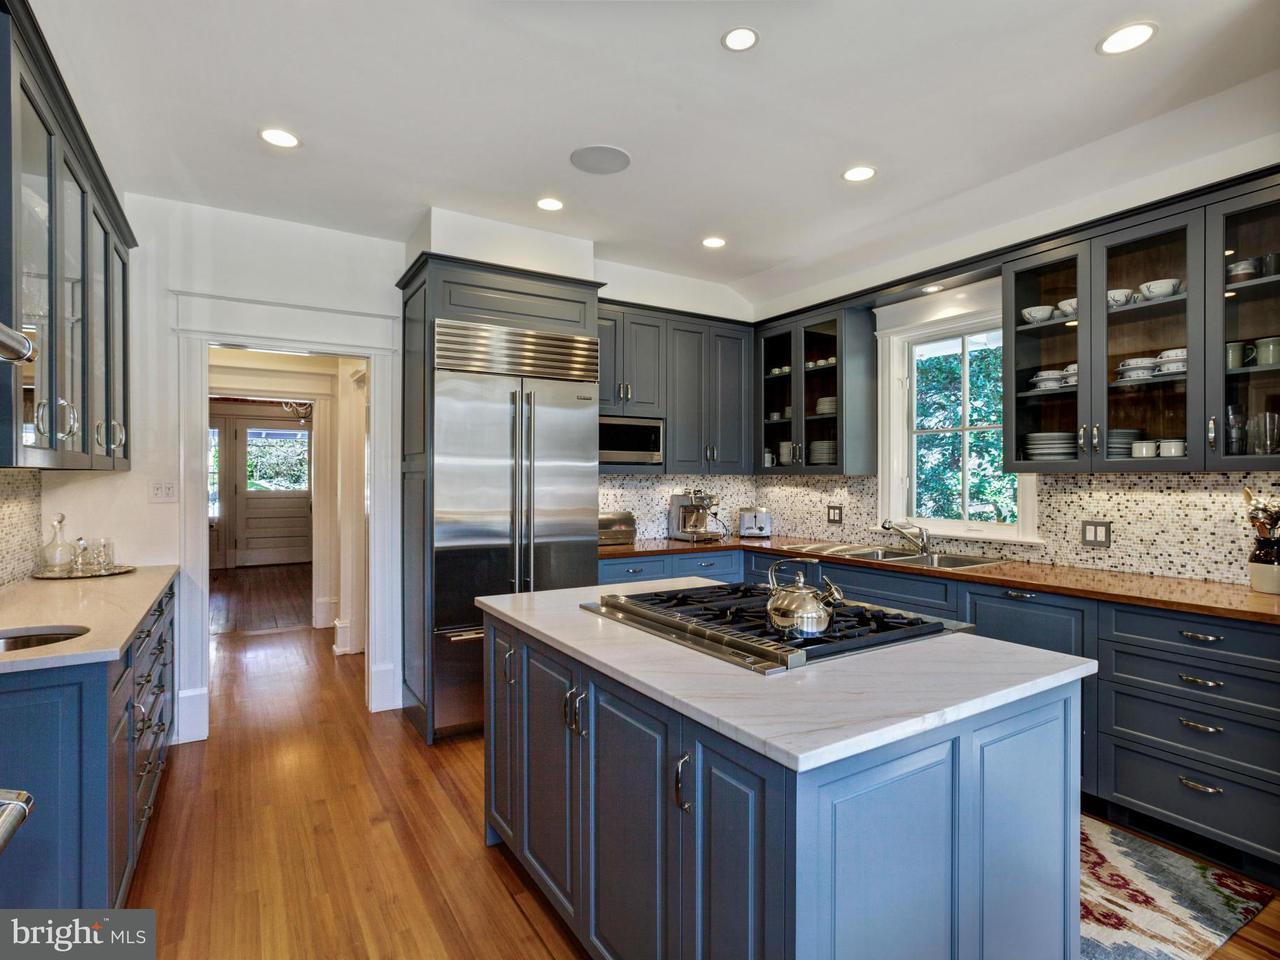 Additional photo for property listing at 2946 NEWARK ST NW 2946 NEWARK ST NW Washington, 컬럼비아주 20008 미국